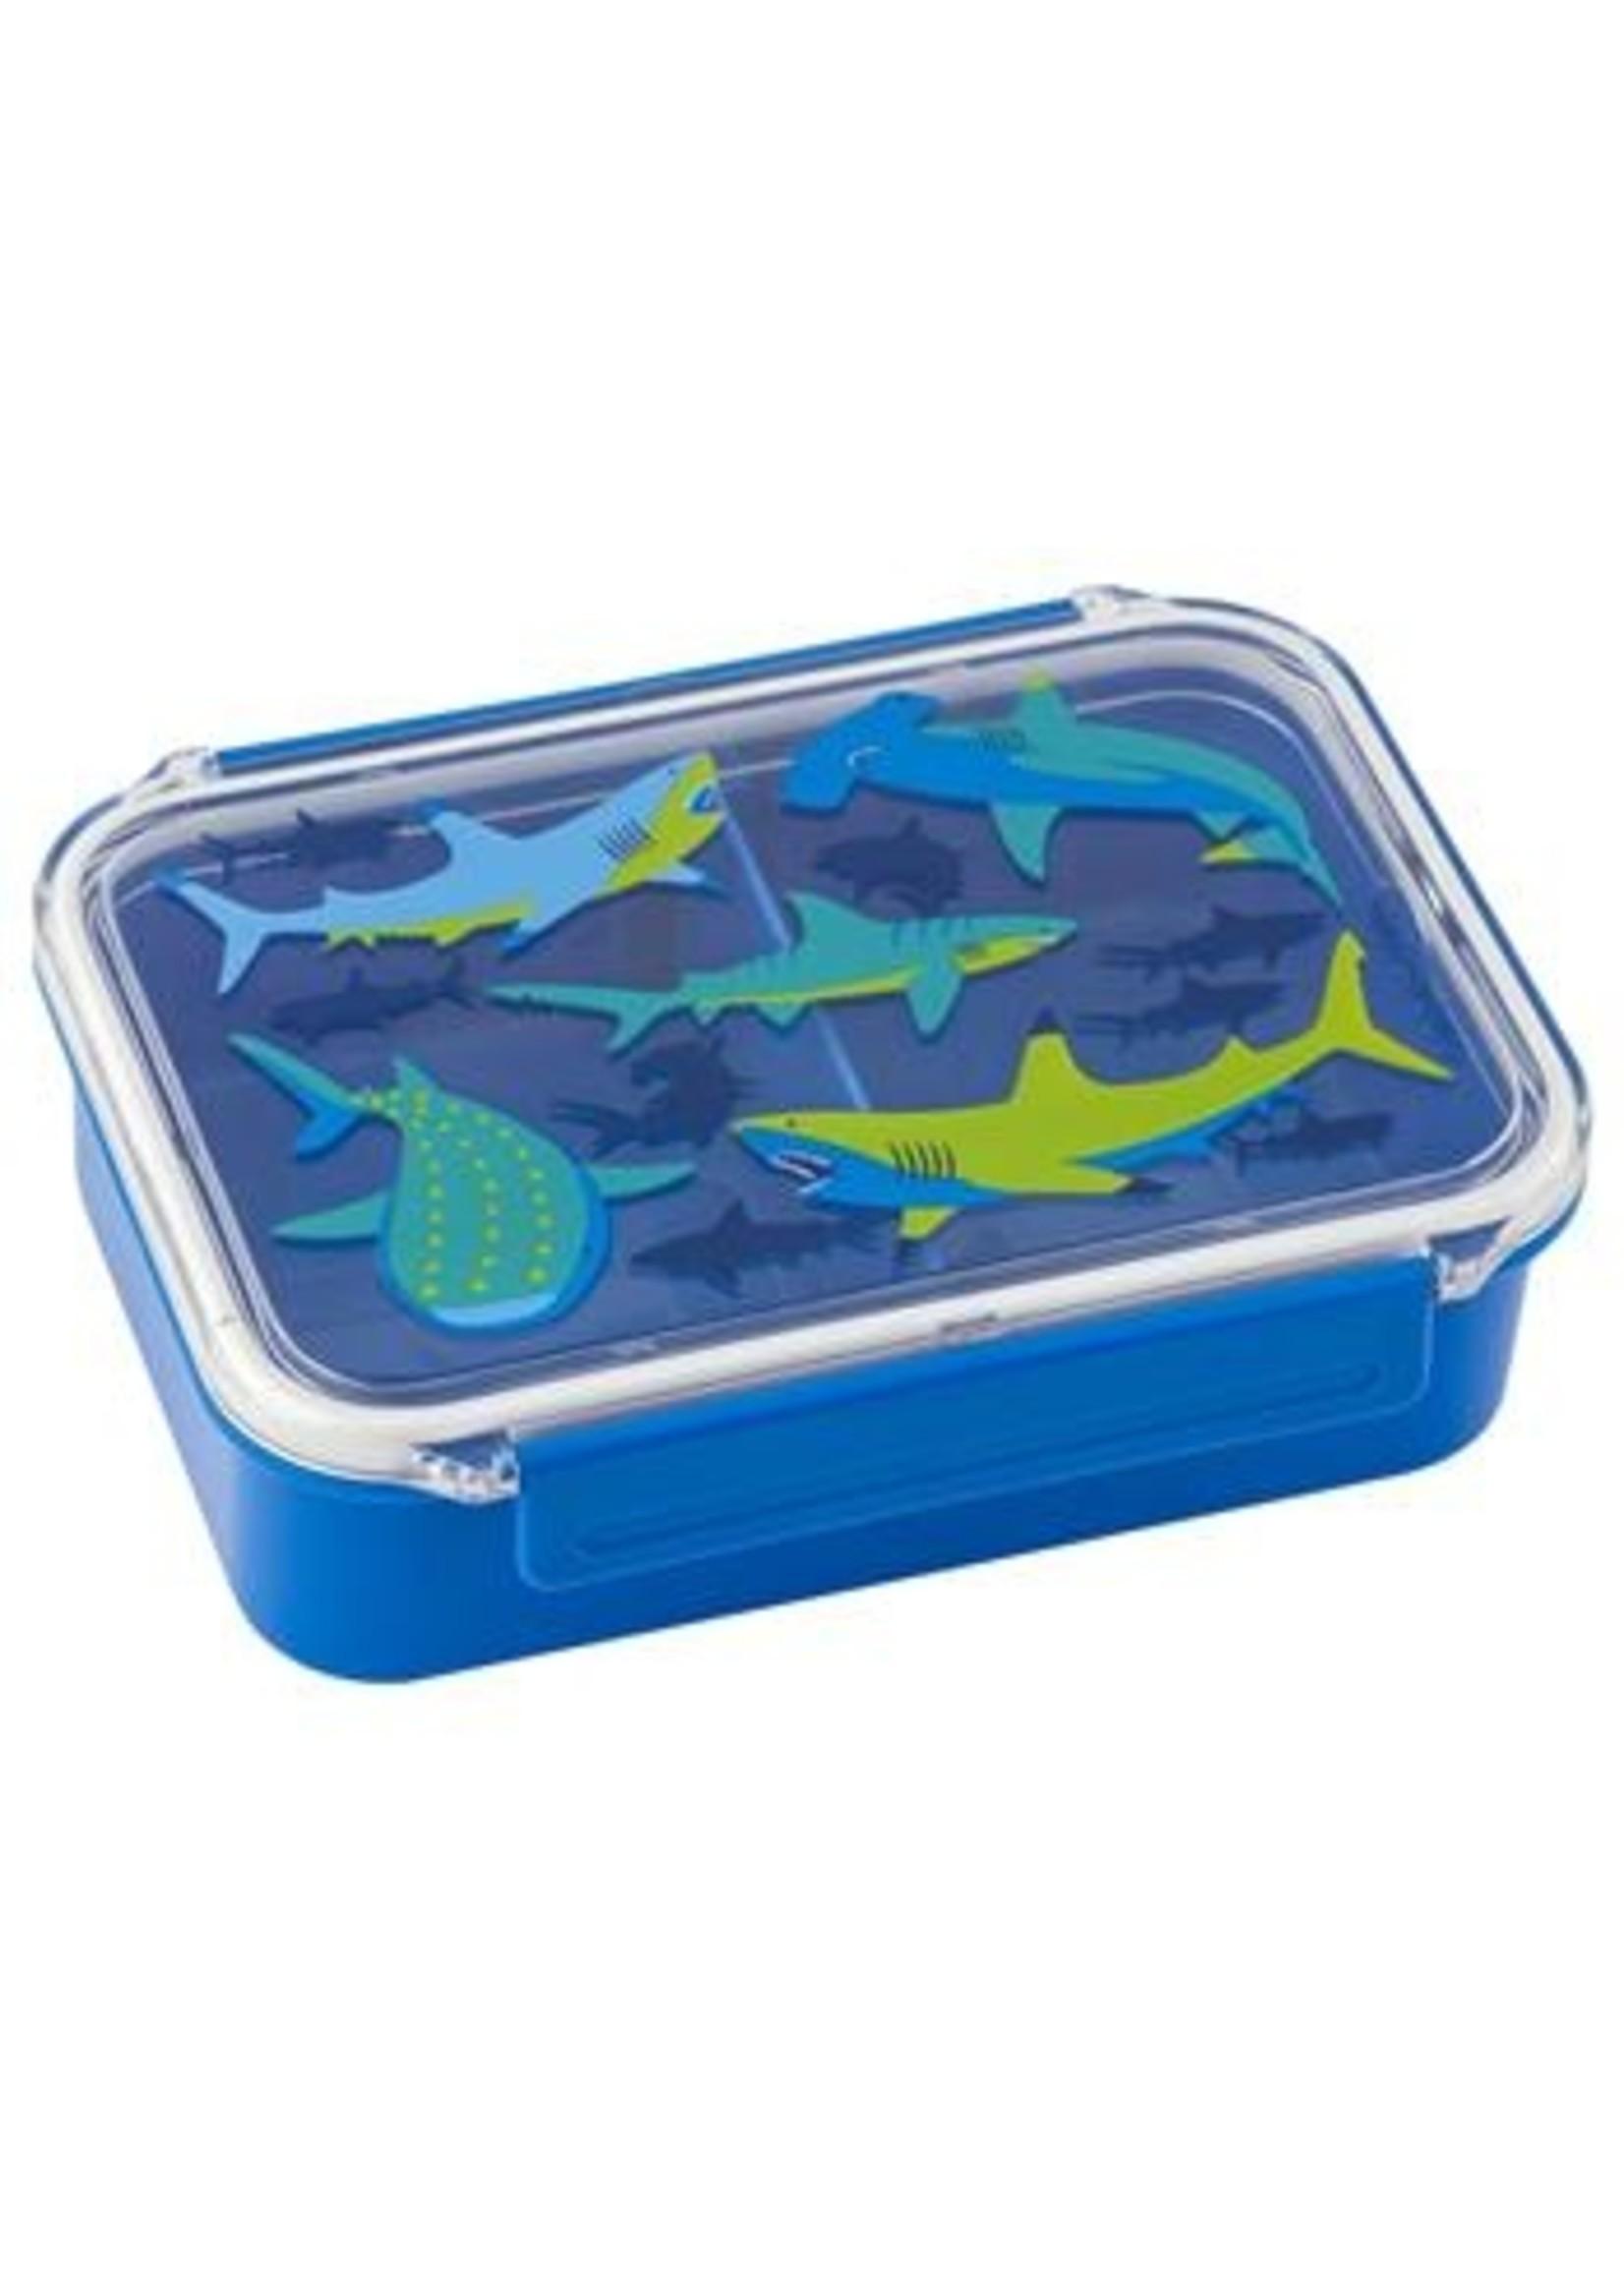 stephen joseph Bento Box - Shark